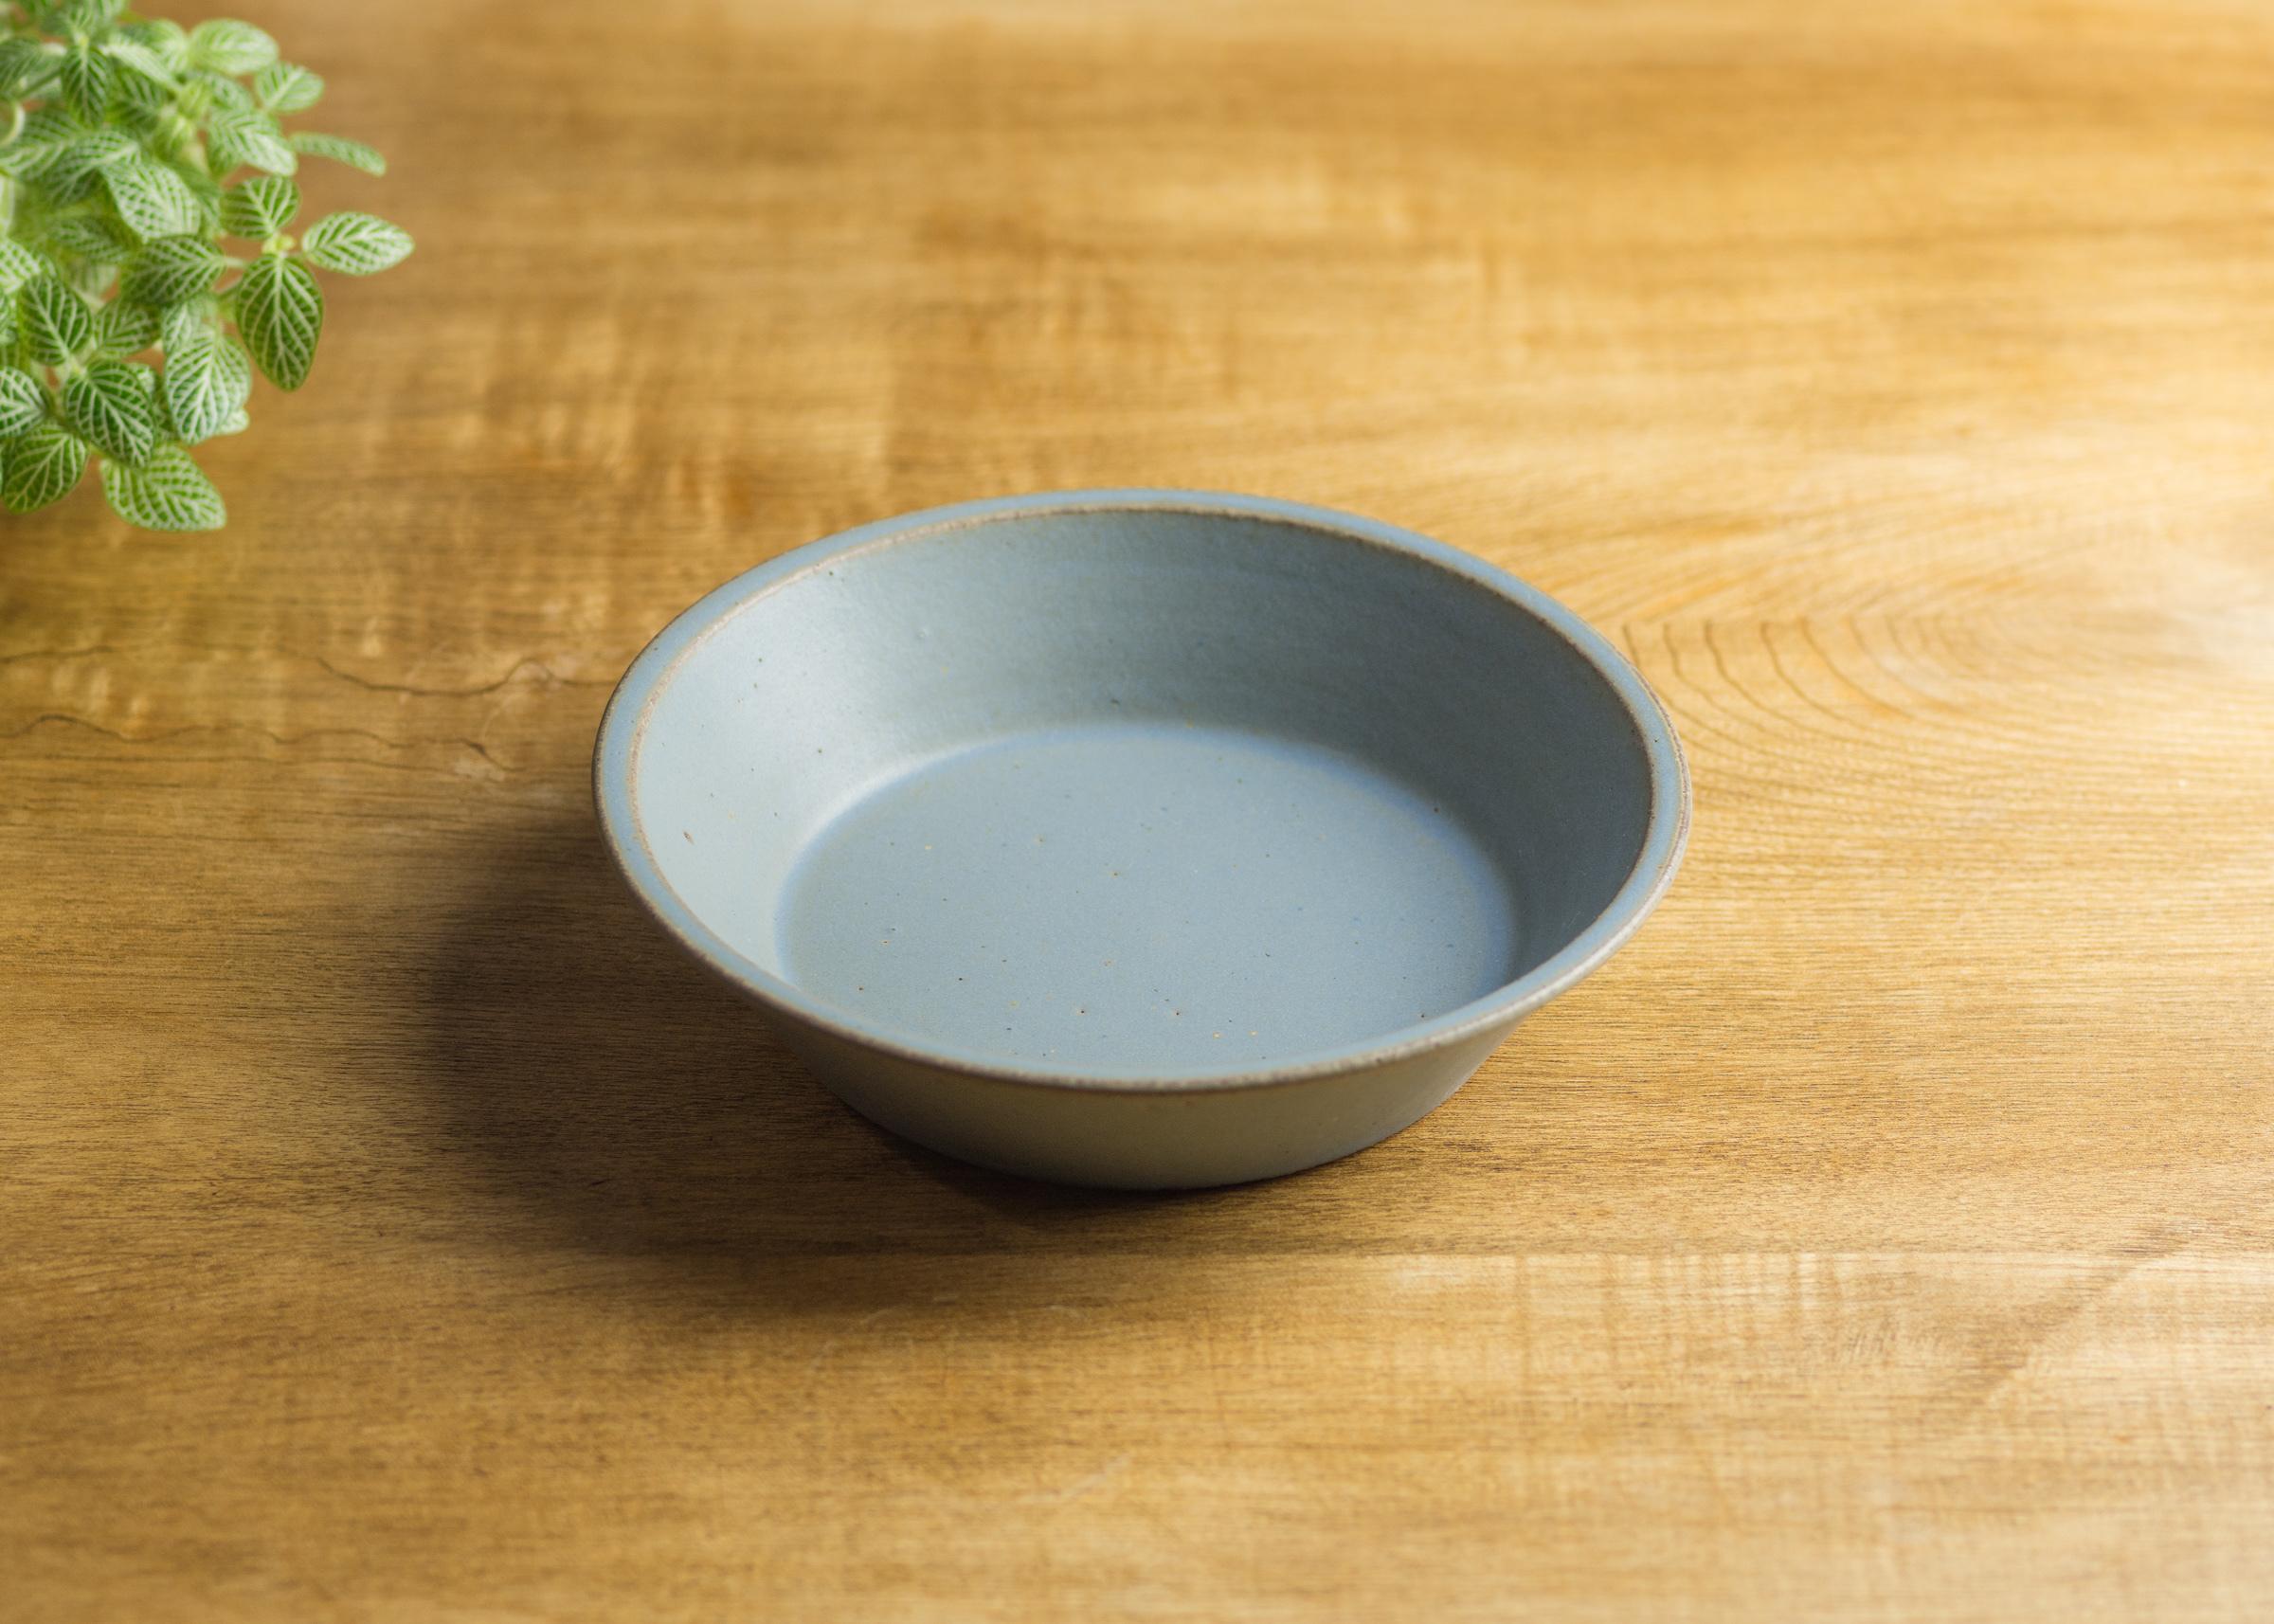 SHIROUMA 浅鉢 18cm 灰色(深皿・スープボウル・グラタン皿・耐熱皿)/長谷川 哲也